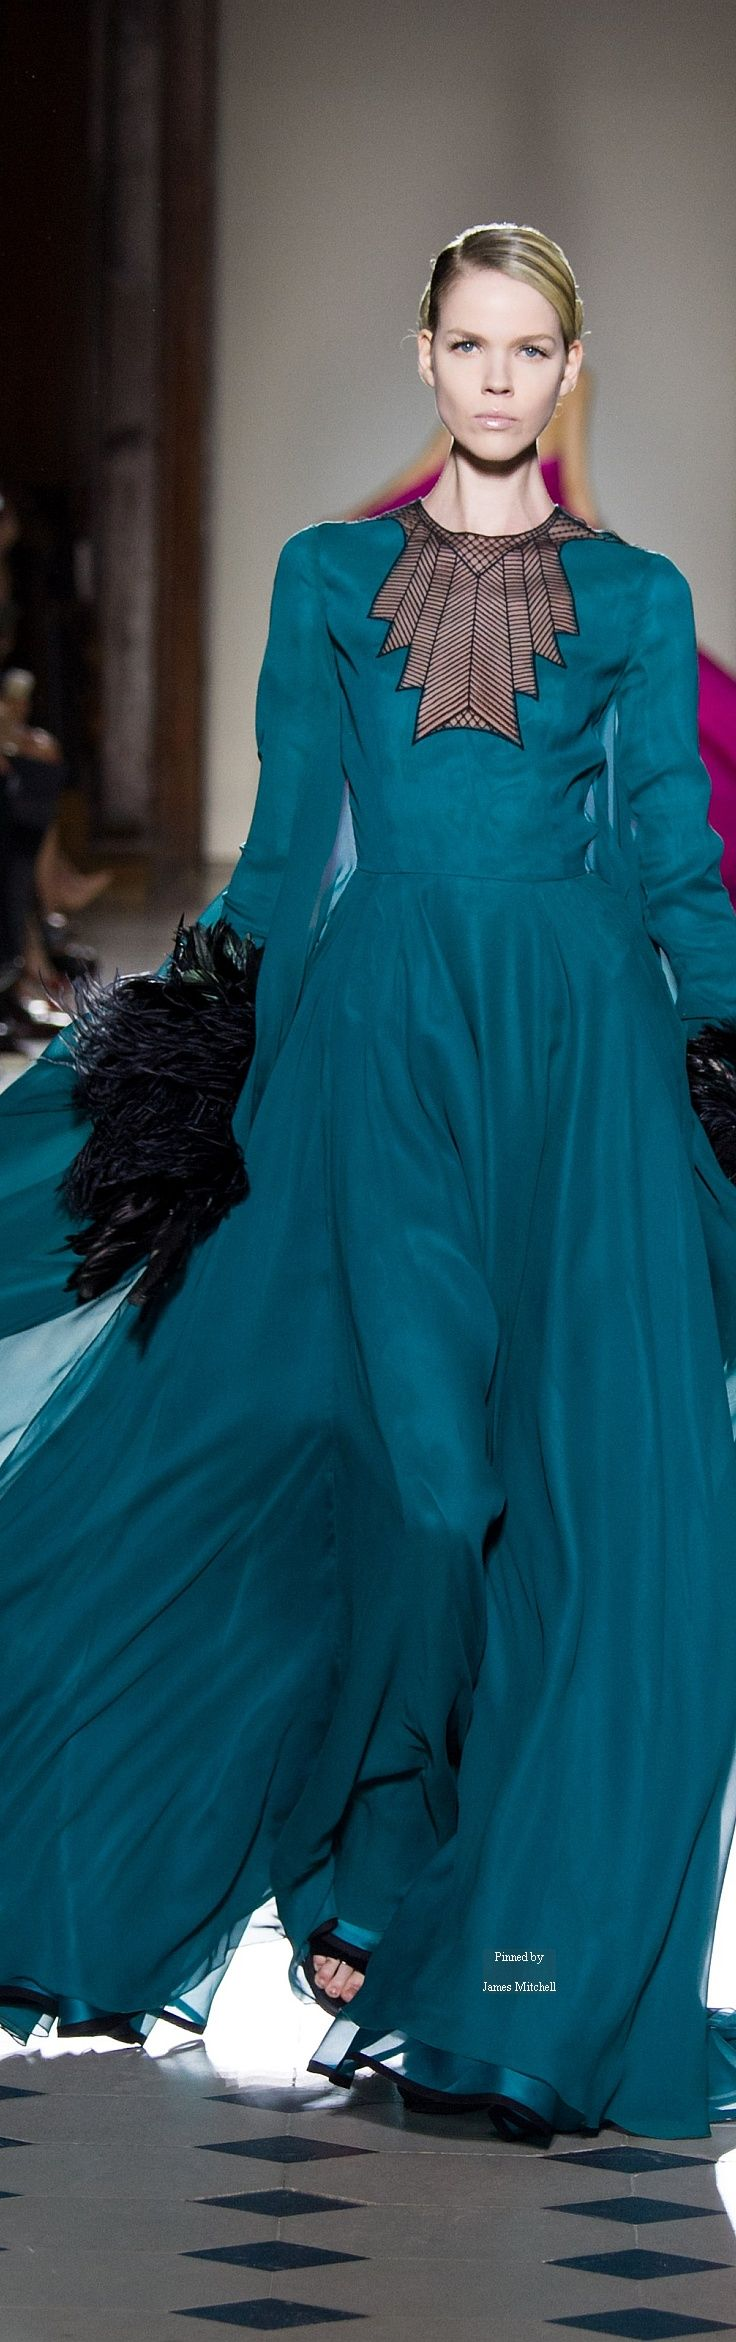 Julien Fournié Haute Couture Fall Winter 2014-15 collection